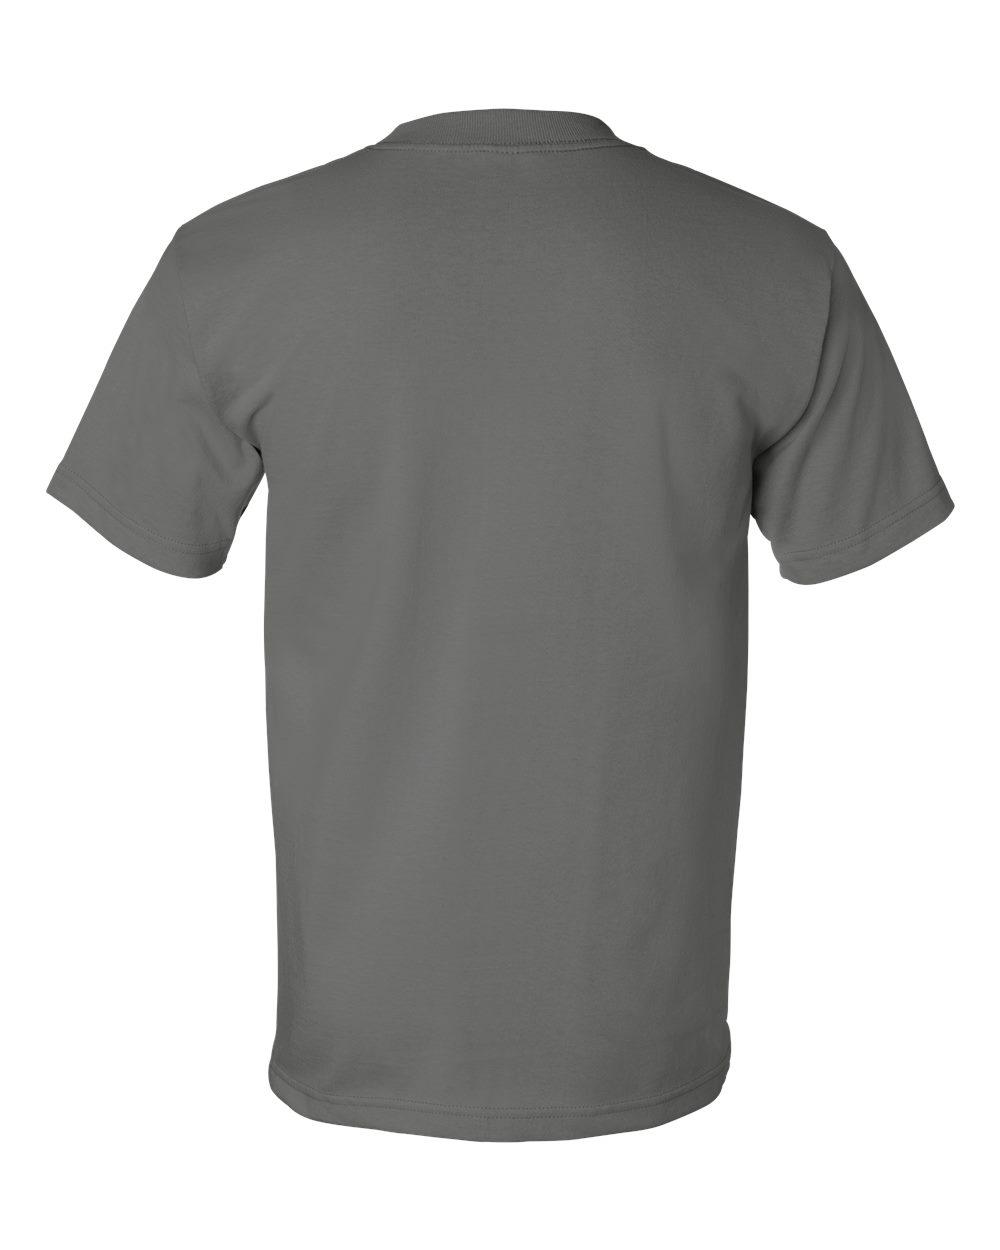 Bayside-Mens-Cotton-Blank-USA-Made-Short-Sleeve-T-Shirt-5100-up-to-5XL thumbnail 16